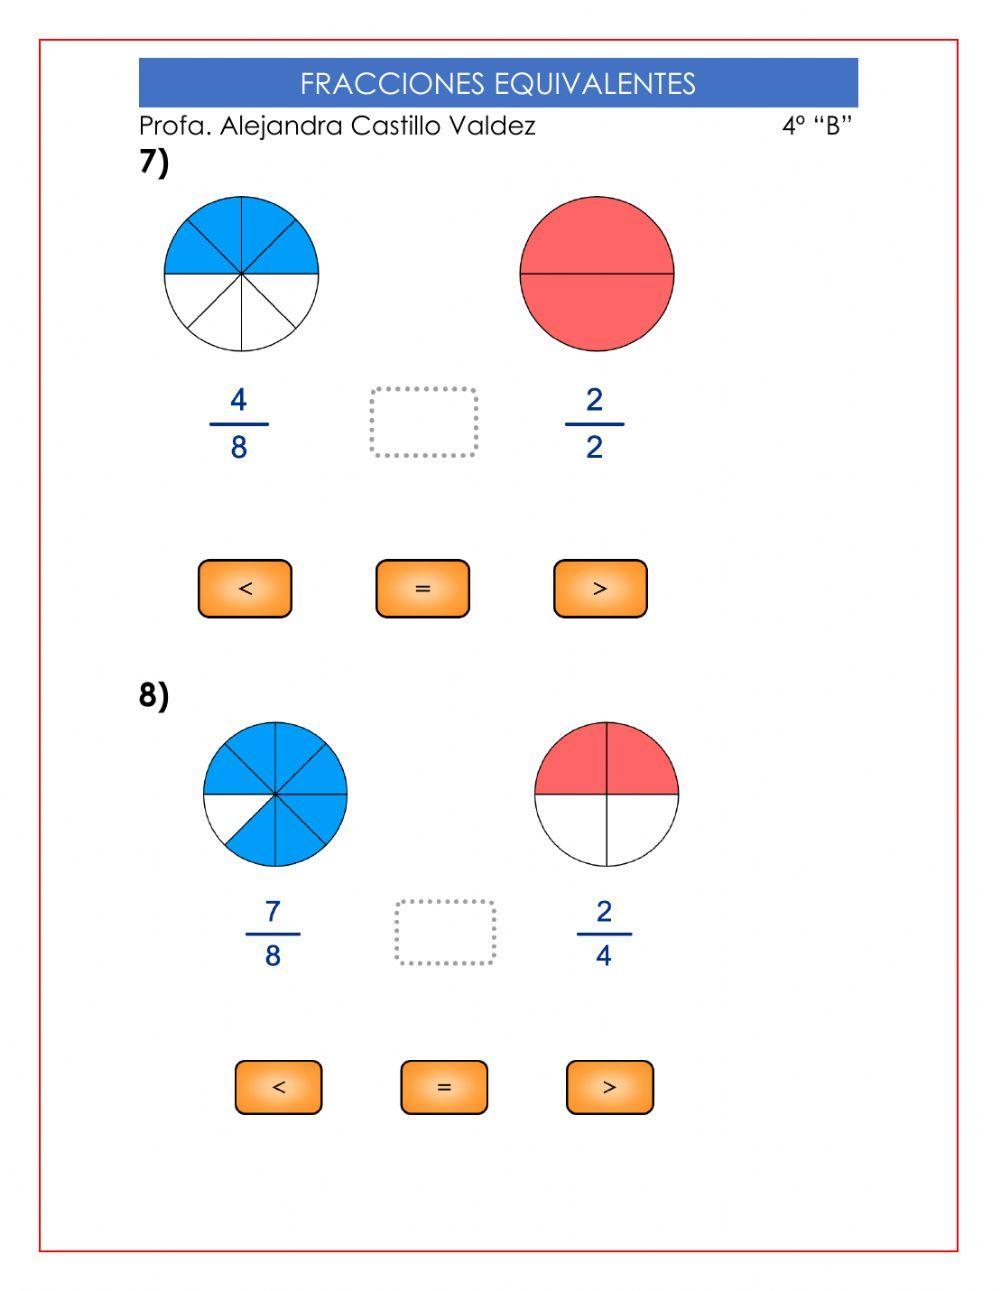 Fracciones Equivalentes 2 Ficha Interactiva Fracciones Equivalentes Fracciones Ejercicios De Fracciones